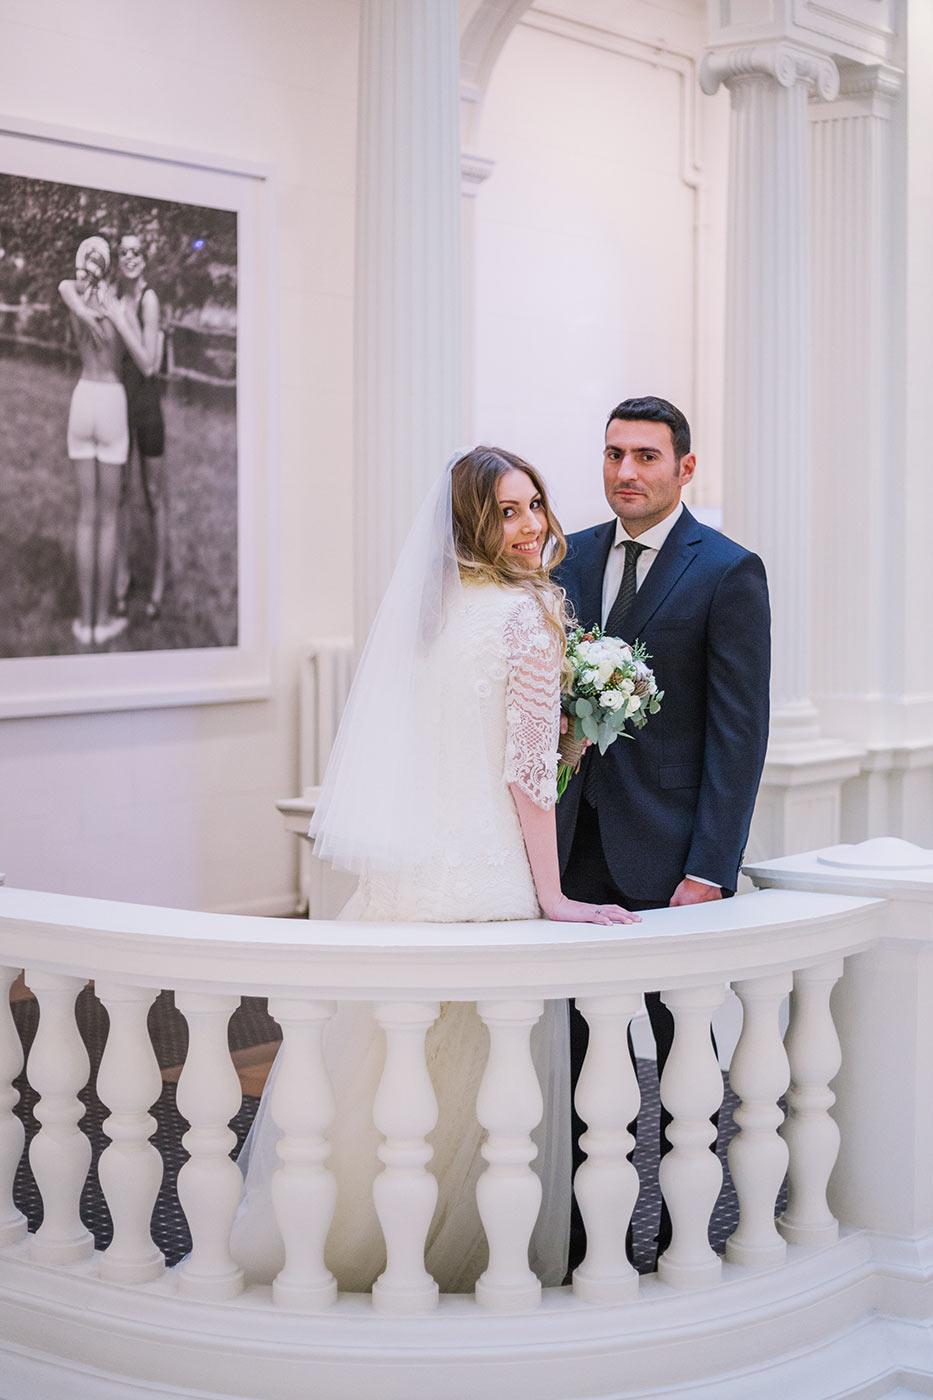 Couple shoot at Gran Via Hotel Barcelona | Fine Art Photographer | Lena Karelova Photography | Destination Wedding Photographer Barcelona |Film Wedding Photographer